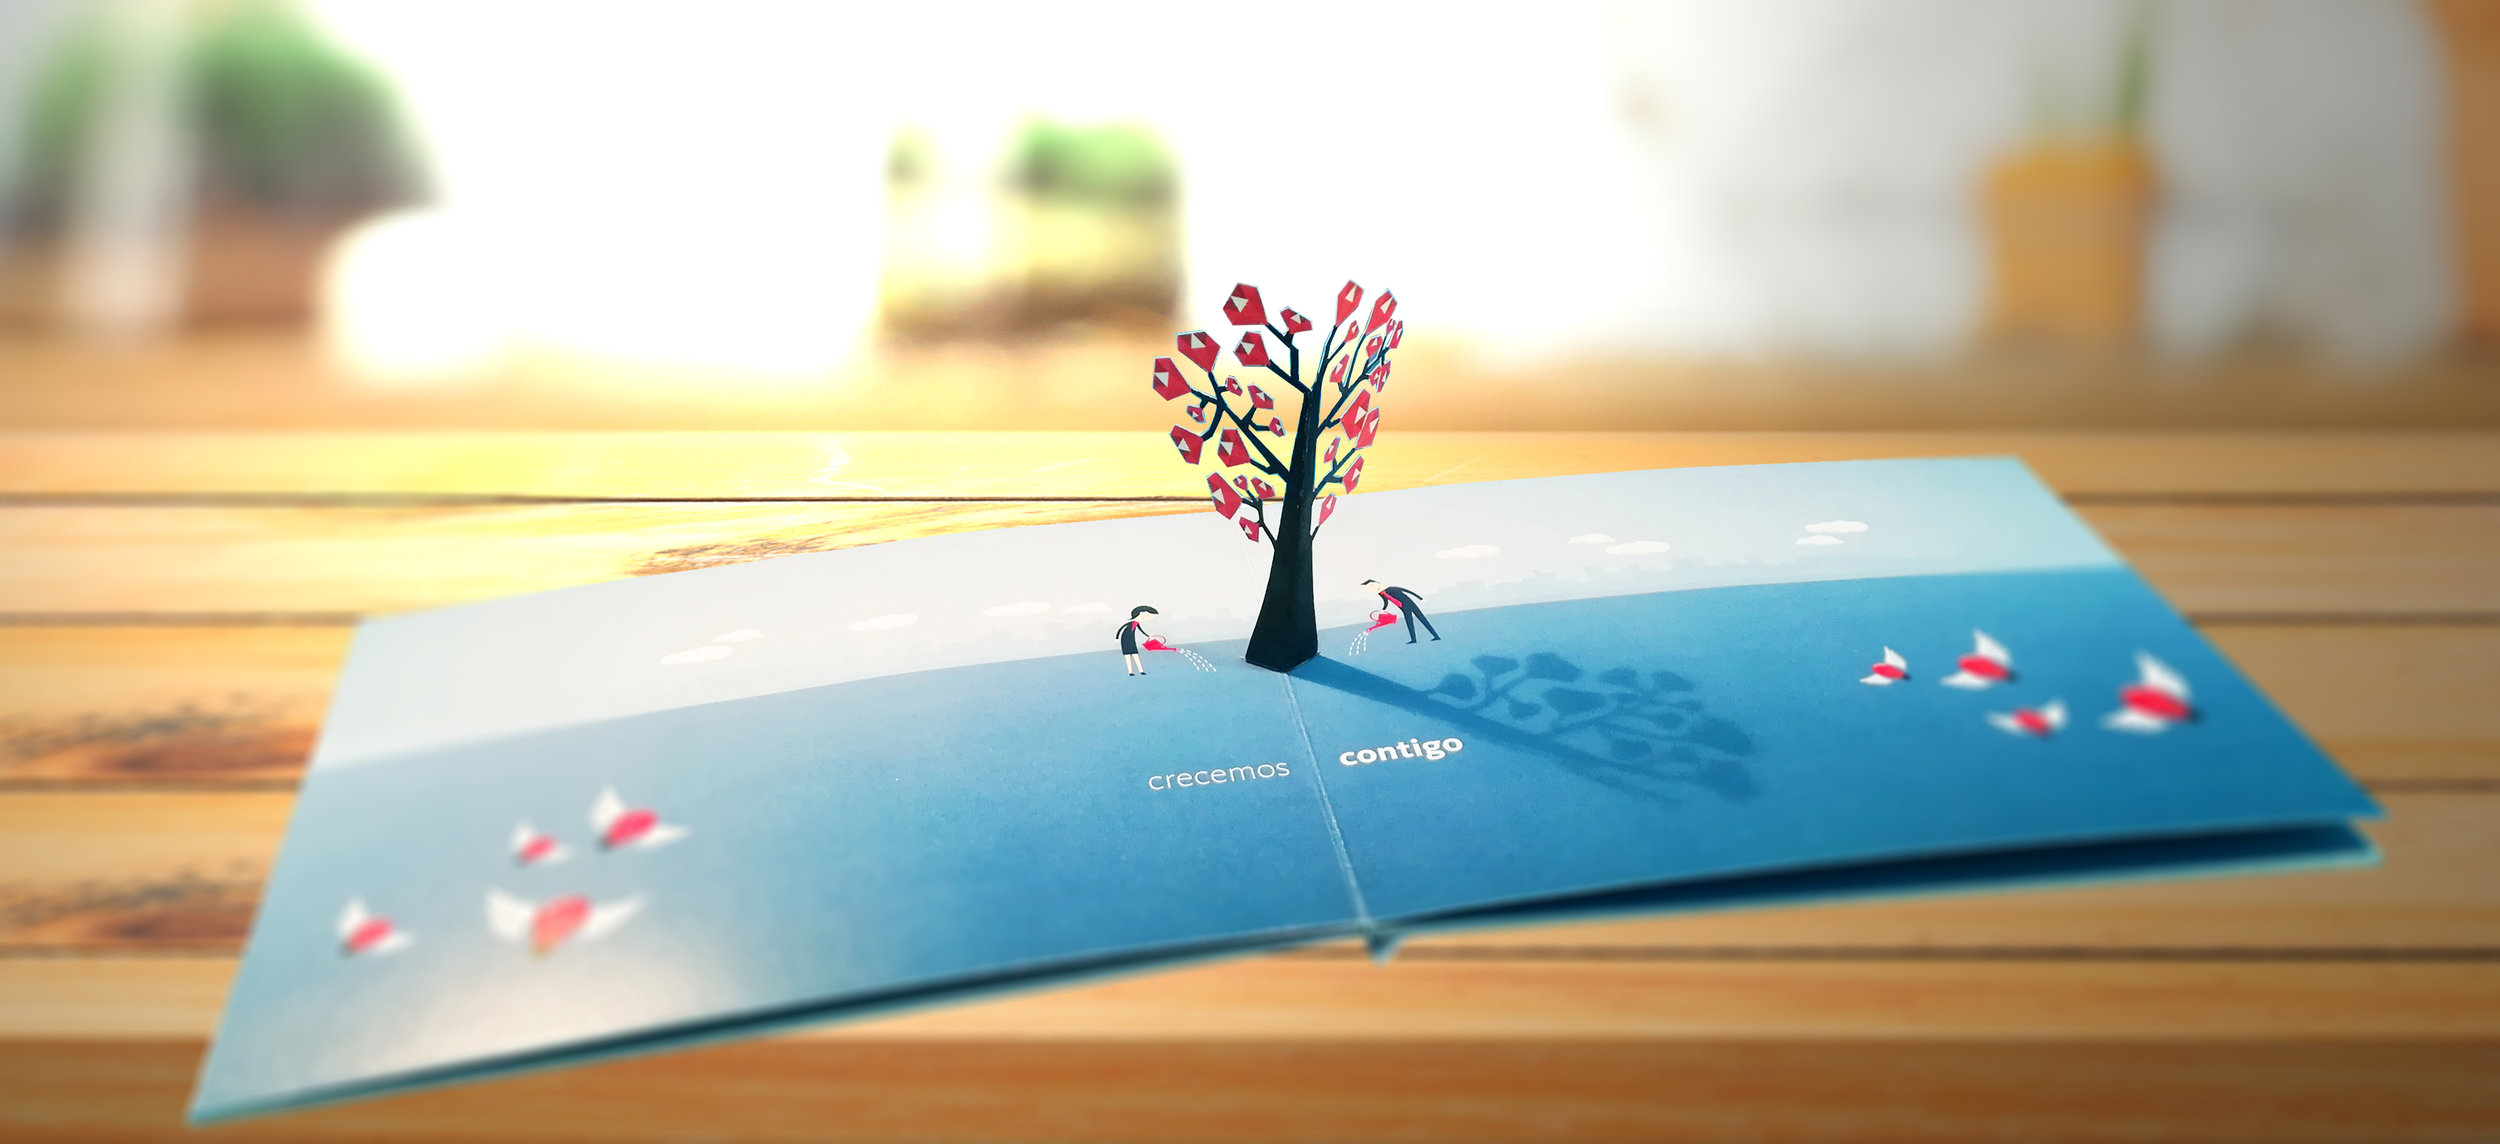 Crecemos contigo - Banco Santander /  Pop up